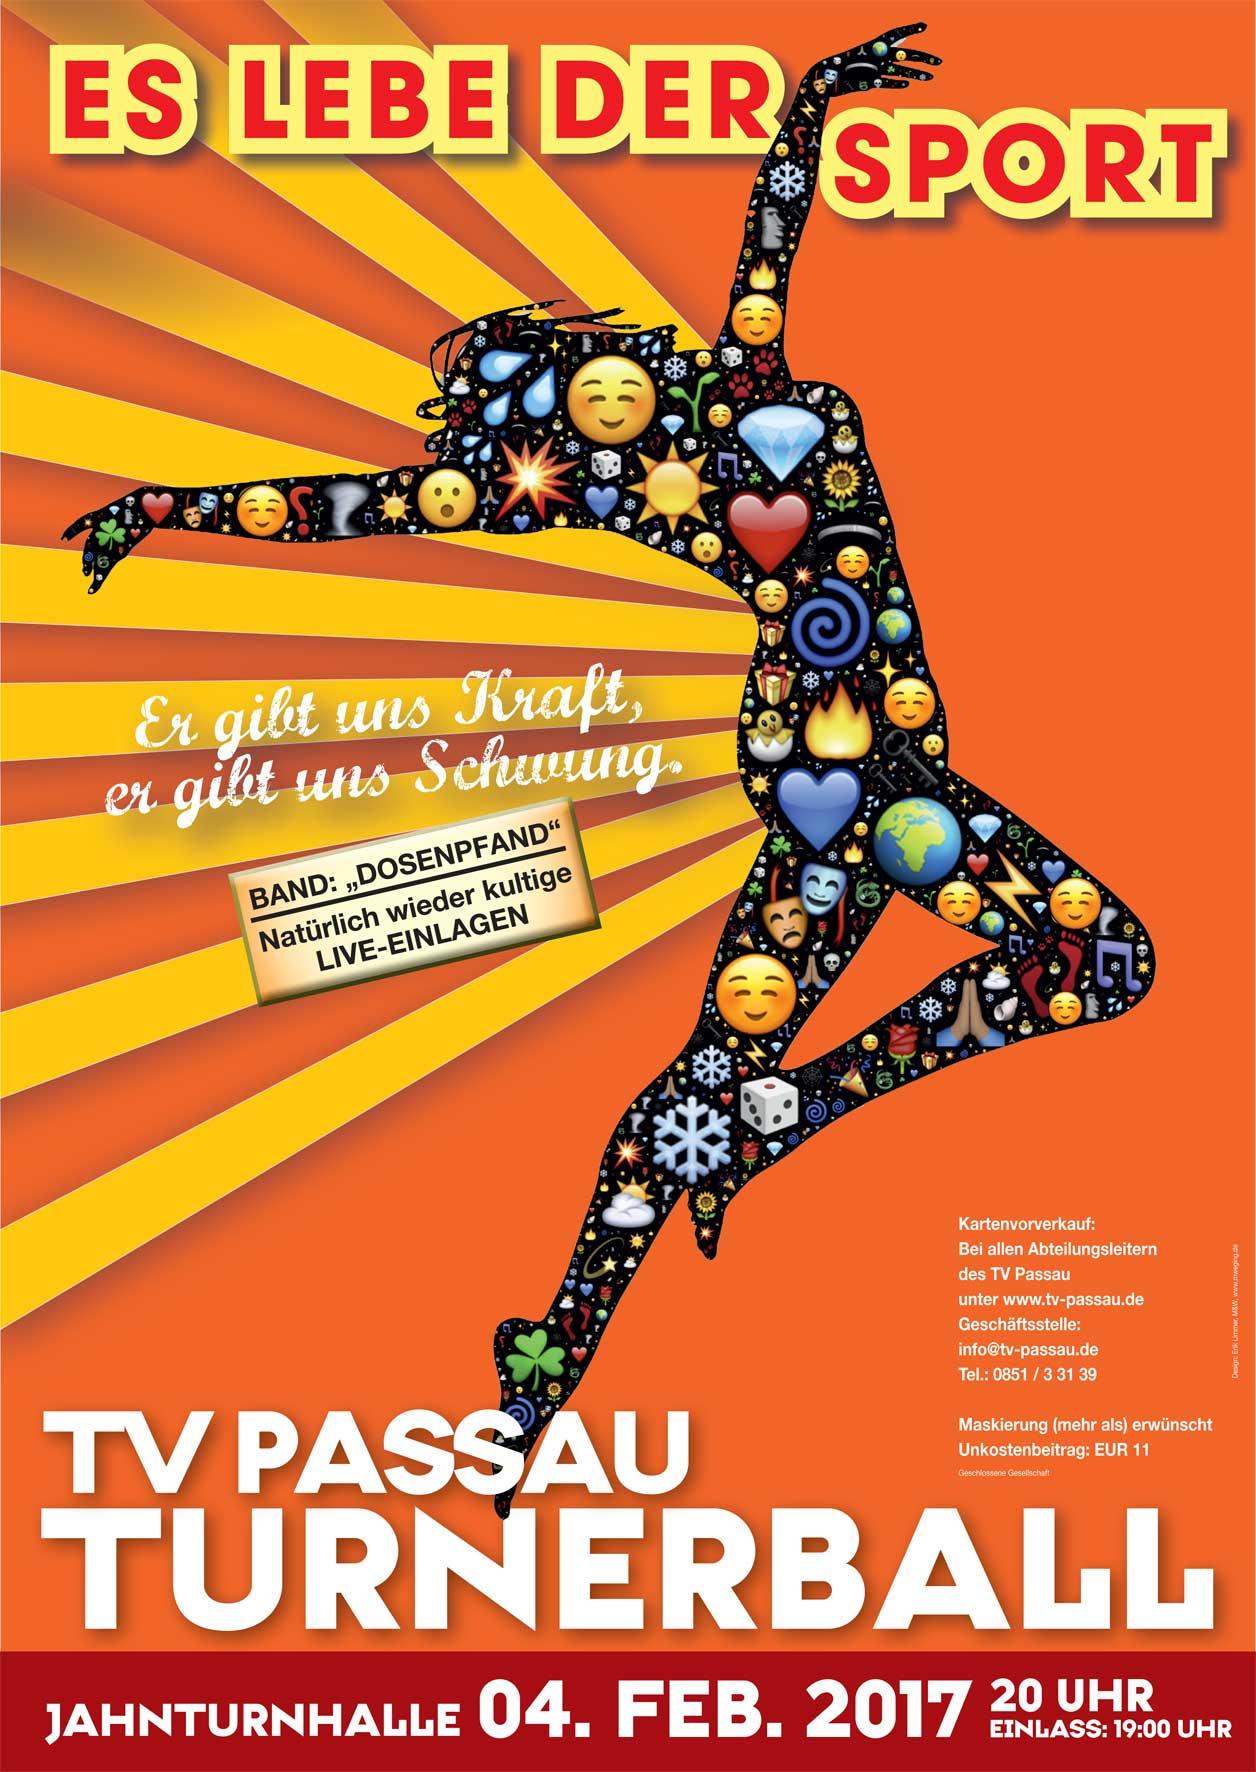 Turnerball LG Passau